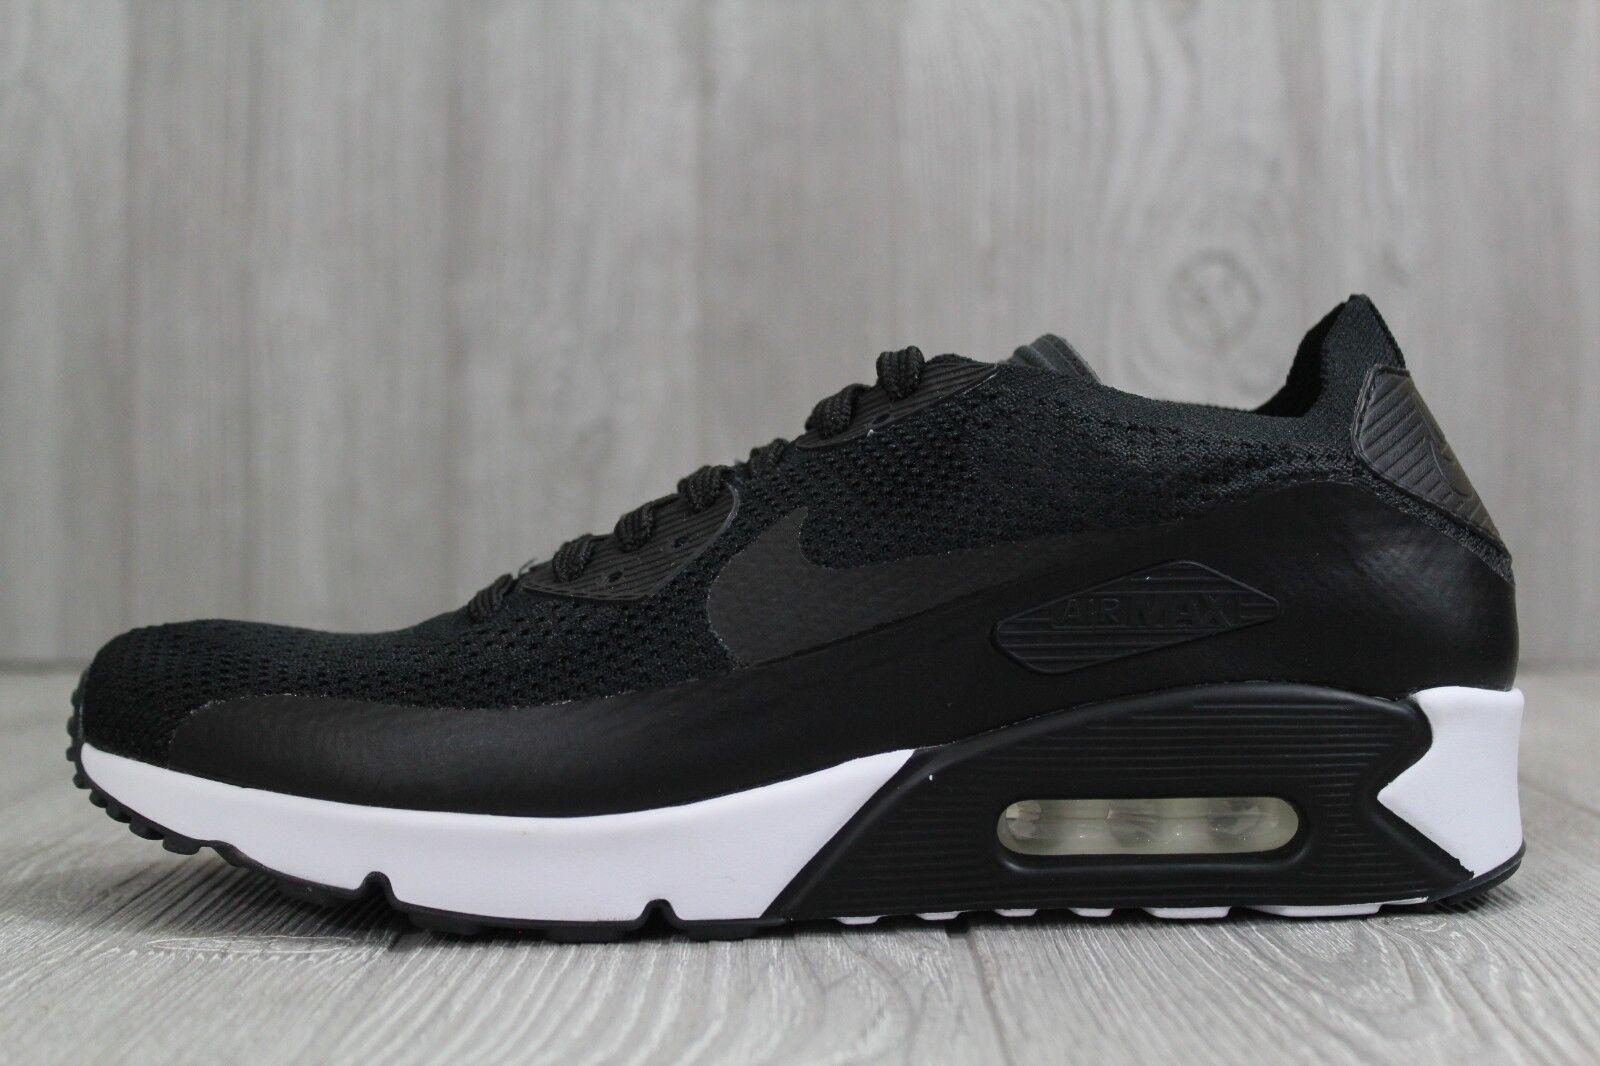 32 Nike Air Max 90 Ultra 2.0 Flyknit Black White Men shoes 875943-004 10 11 11.5